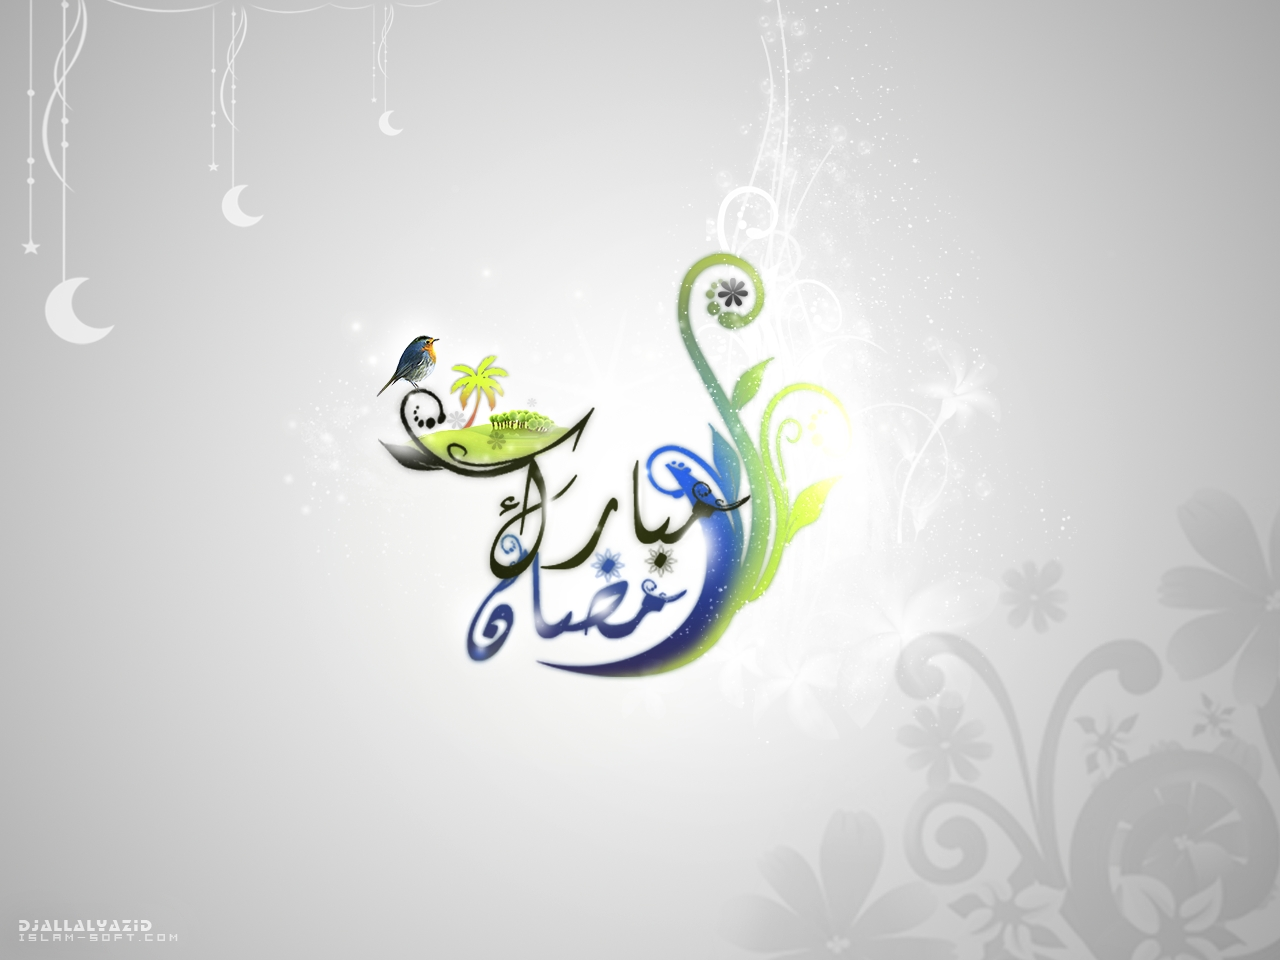 Ramadan Mubarak alikome by djallalyazid